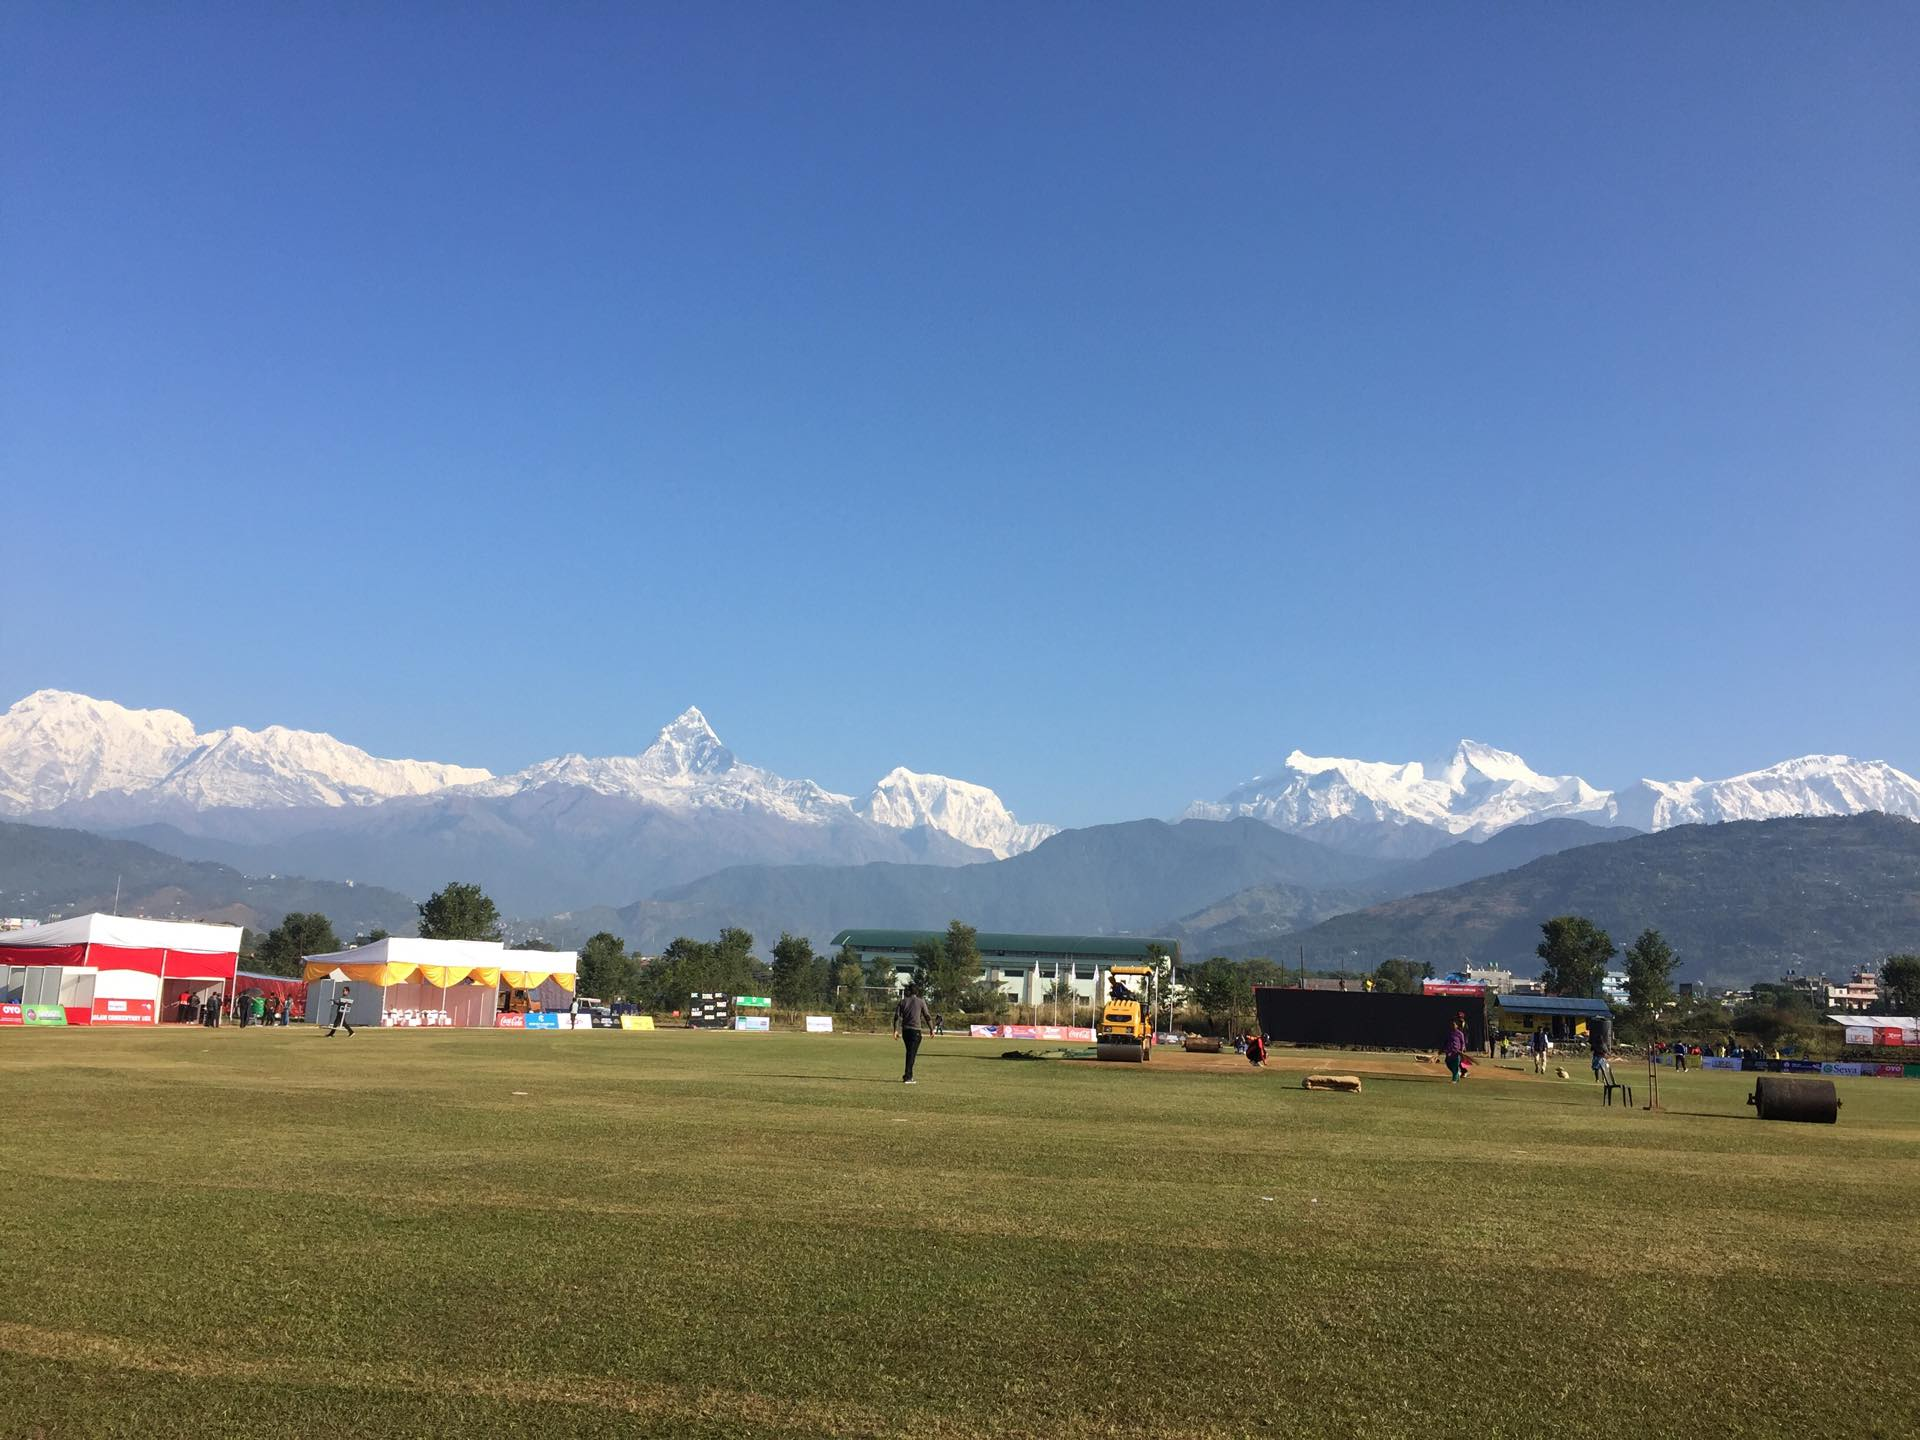 PPL Pokhara pic